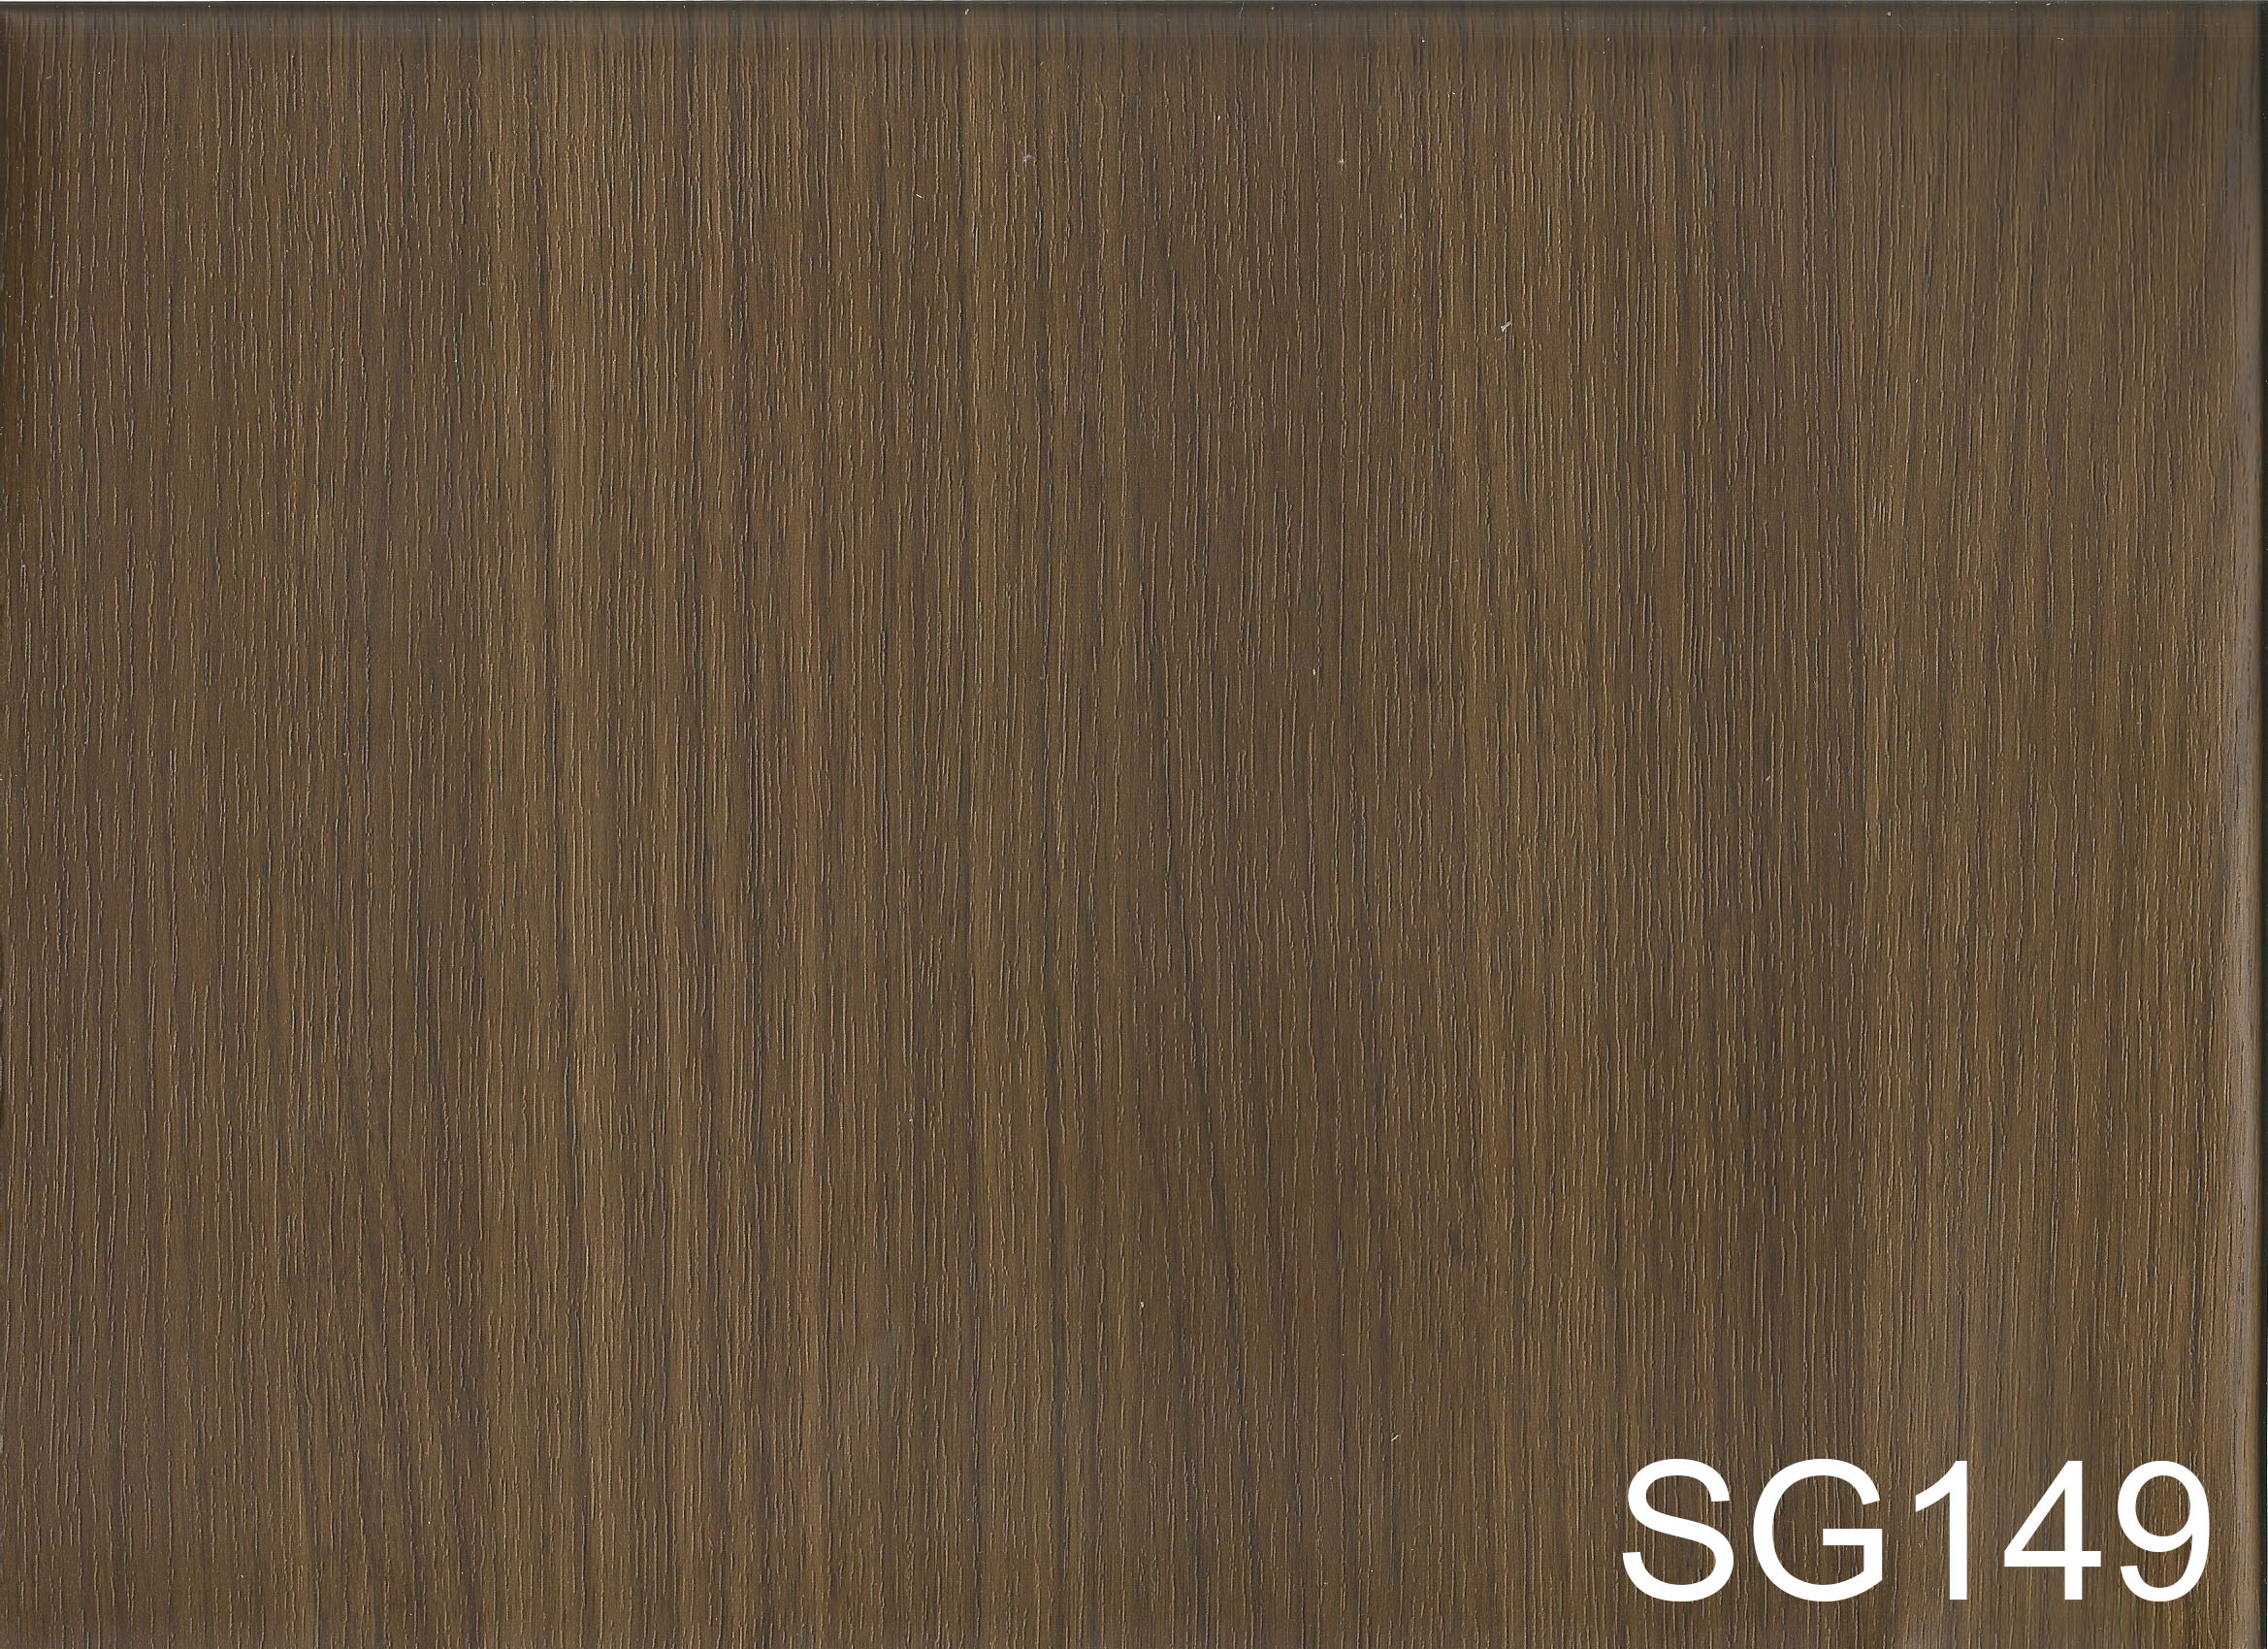 SG149